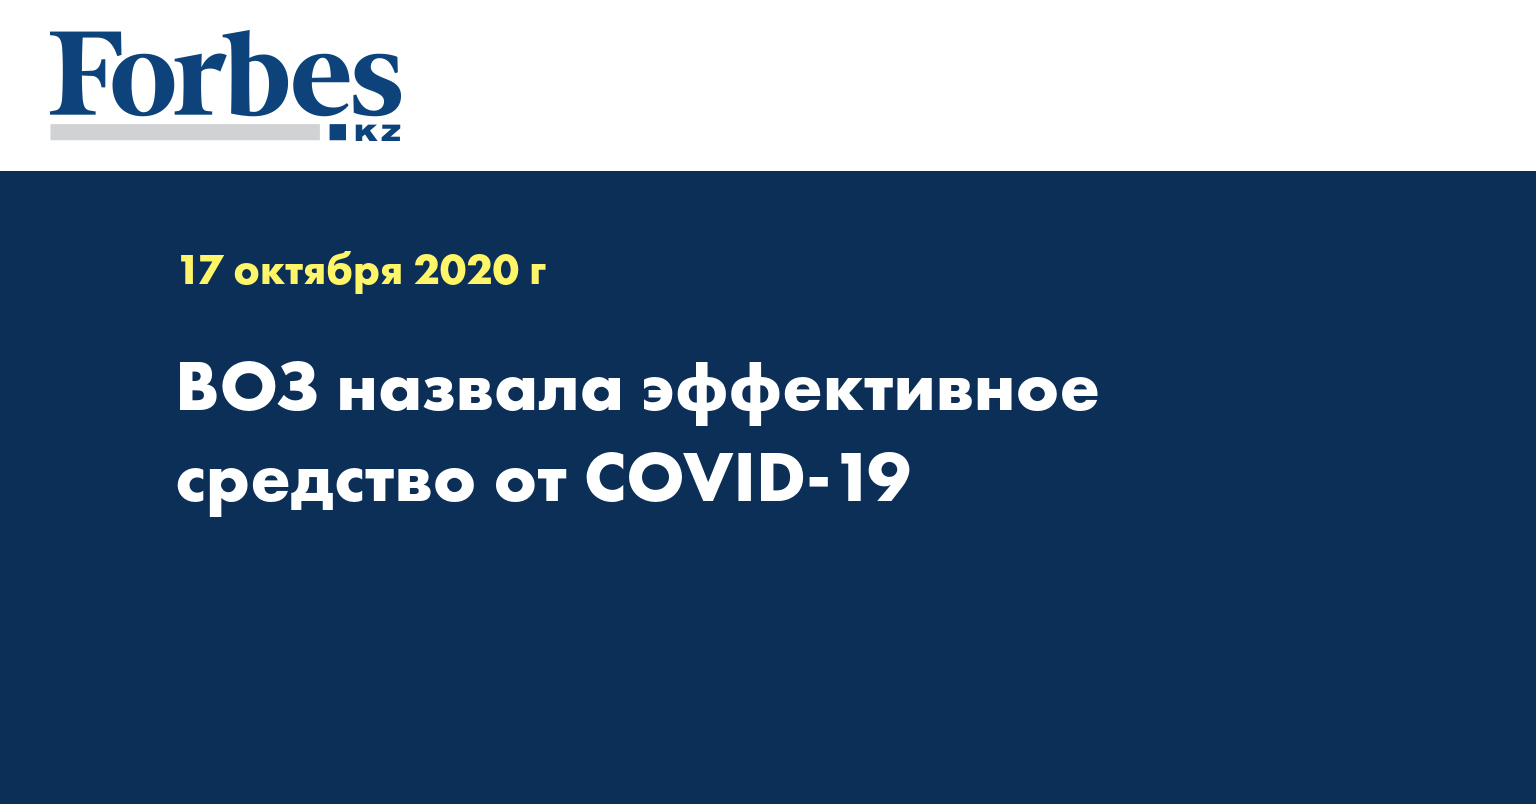 ВОЗ назвала эффективное средство от COVID-19